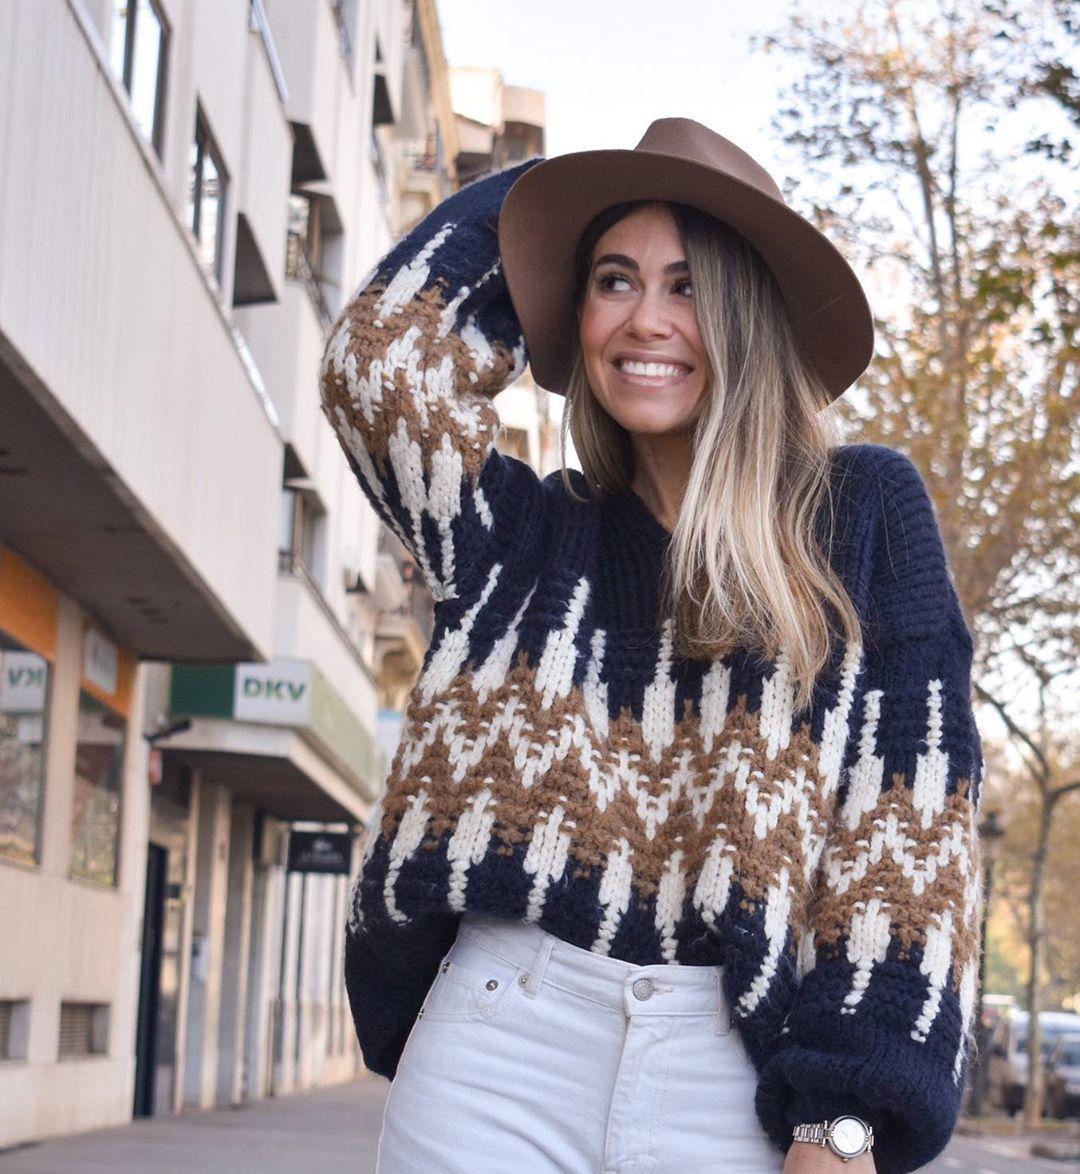 jacquard sweater with puff sleeves de Zara sur miriammaestre_